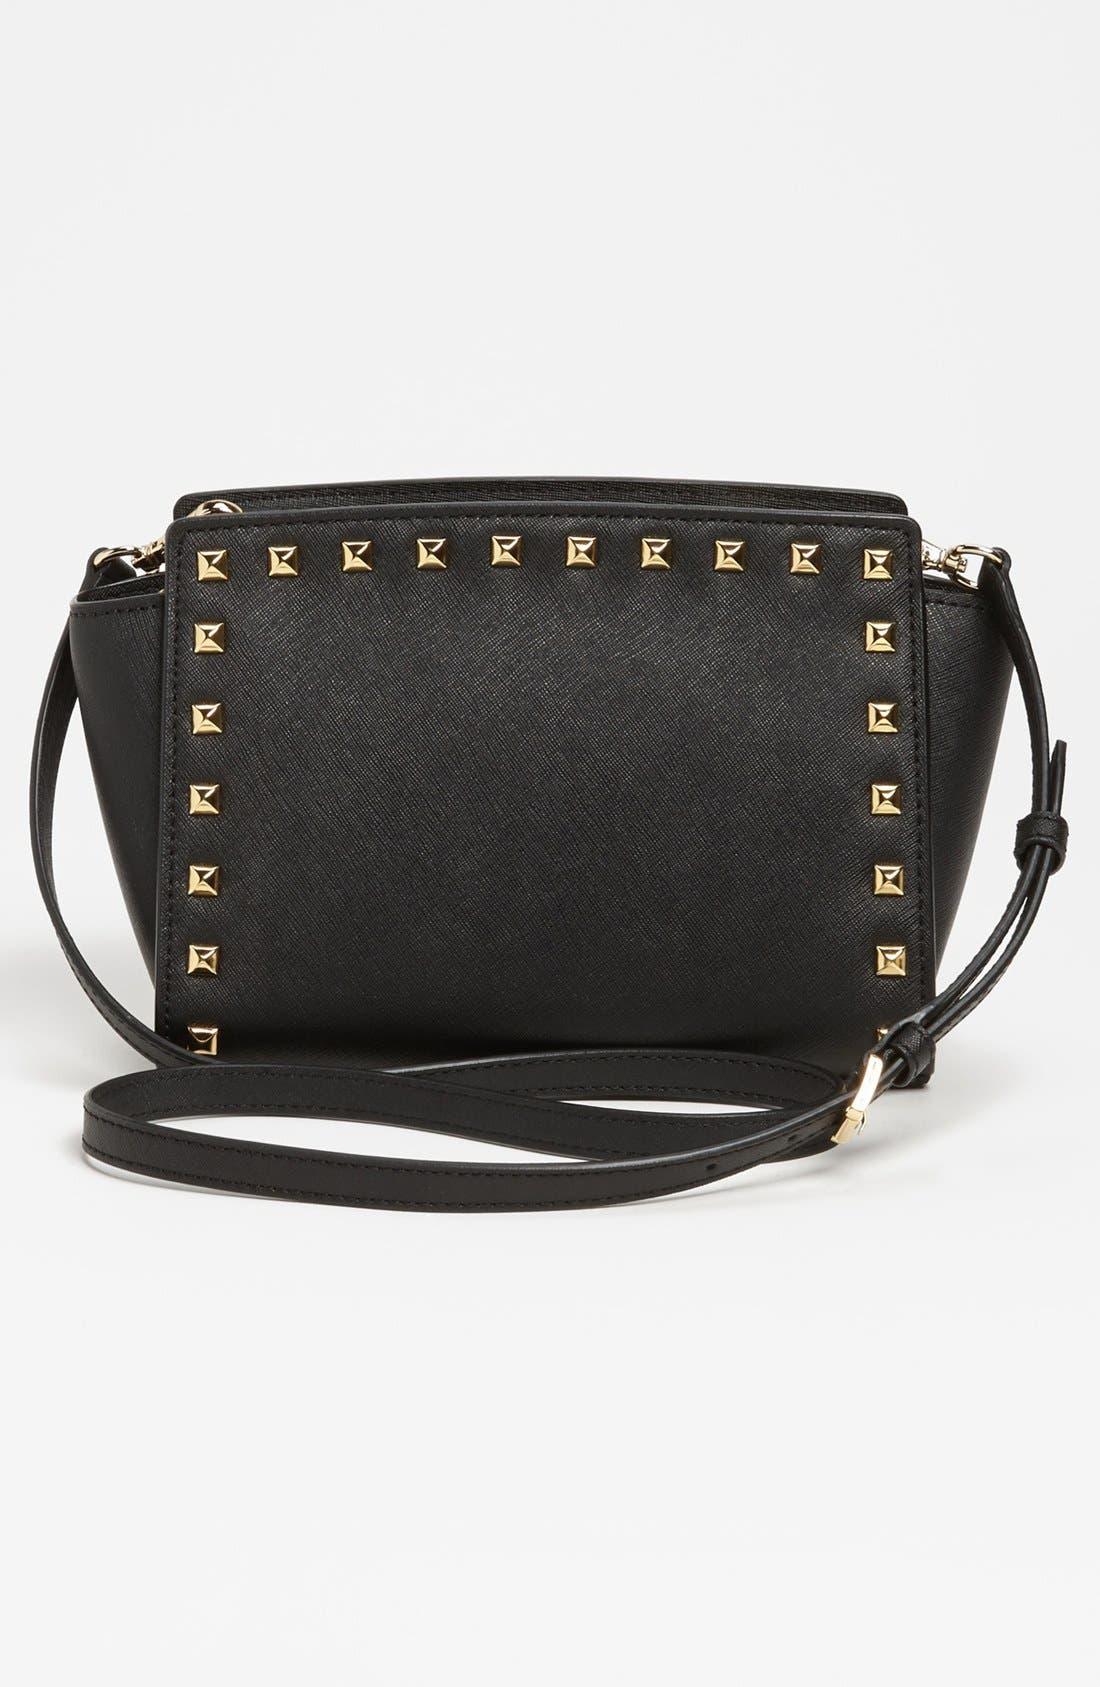 'Selma - Stud' Saffiano Leather Crossbody Bag,                             Alternate thumbnail 2, color,                             001